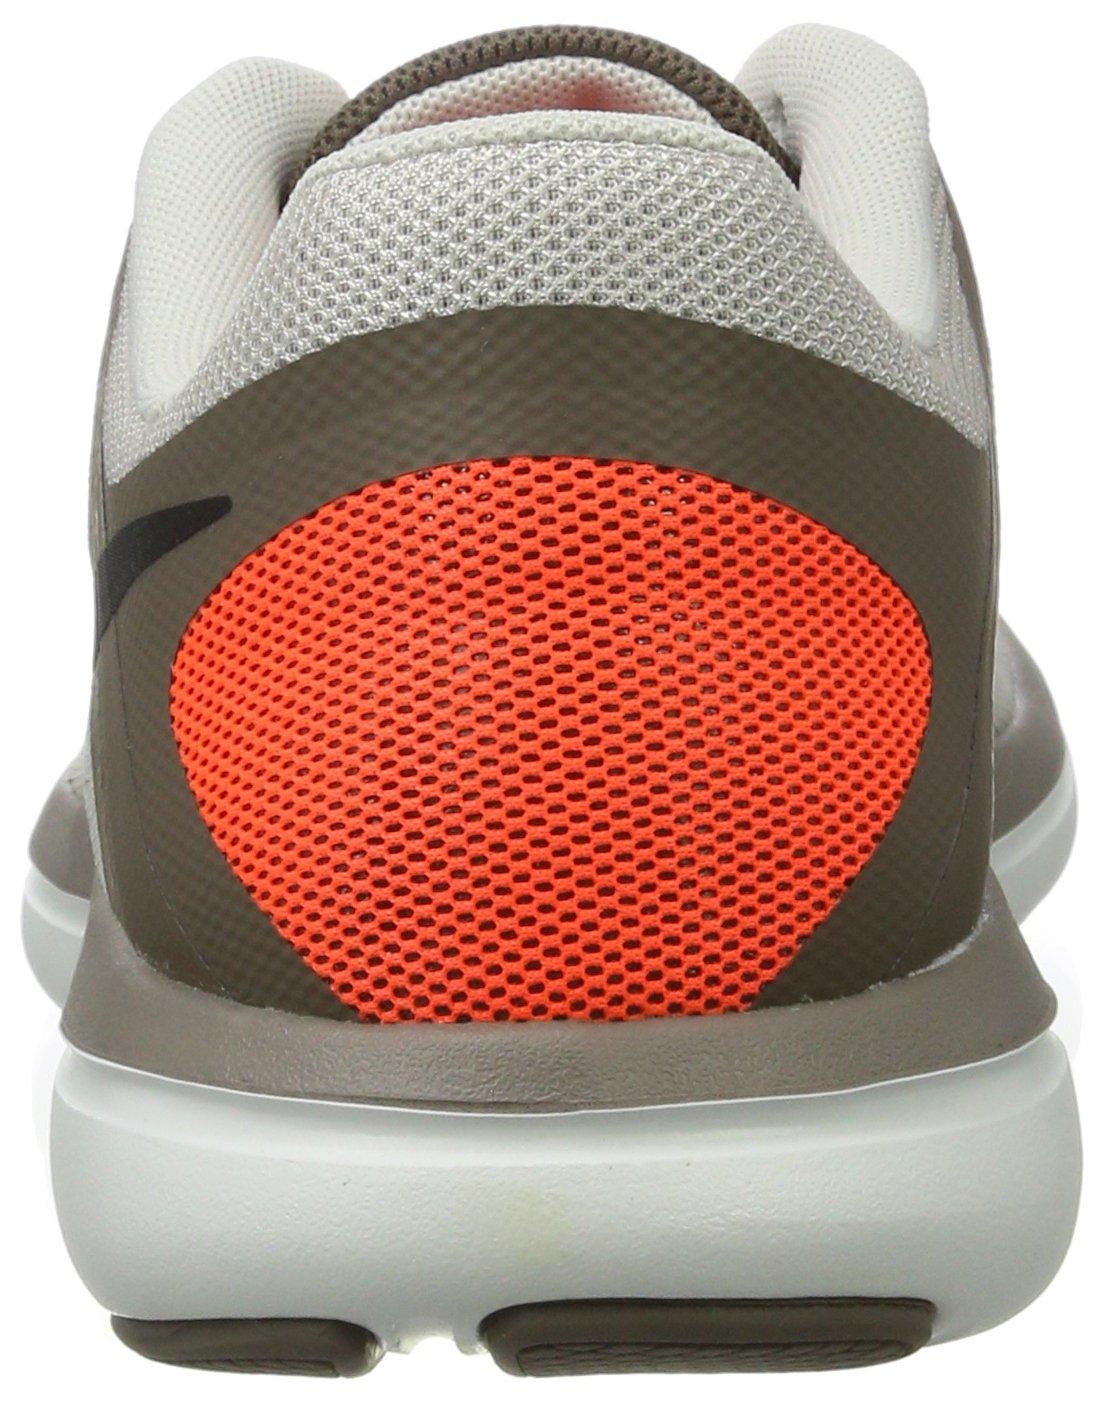 Nike Mens Flex 2016 RN Running Shoe Light Bone/Dark Mushroom/Hyper Orange/Black 8.5 D(M) US by NIKE (Image #2)